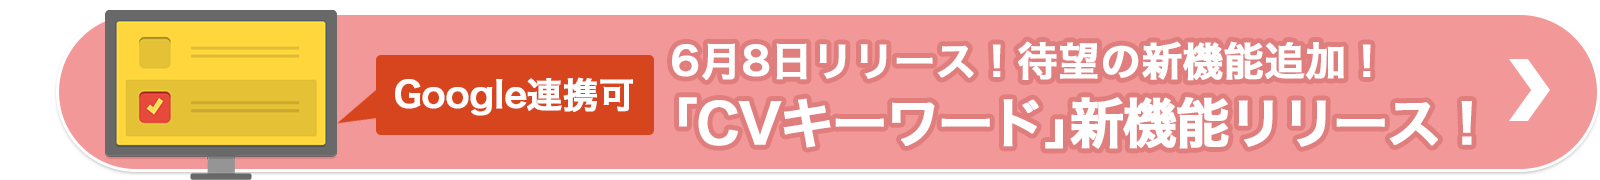 CVキーワードとCV見込みキーワード機能が追加!